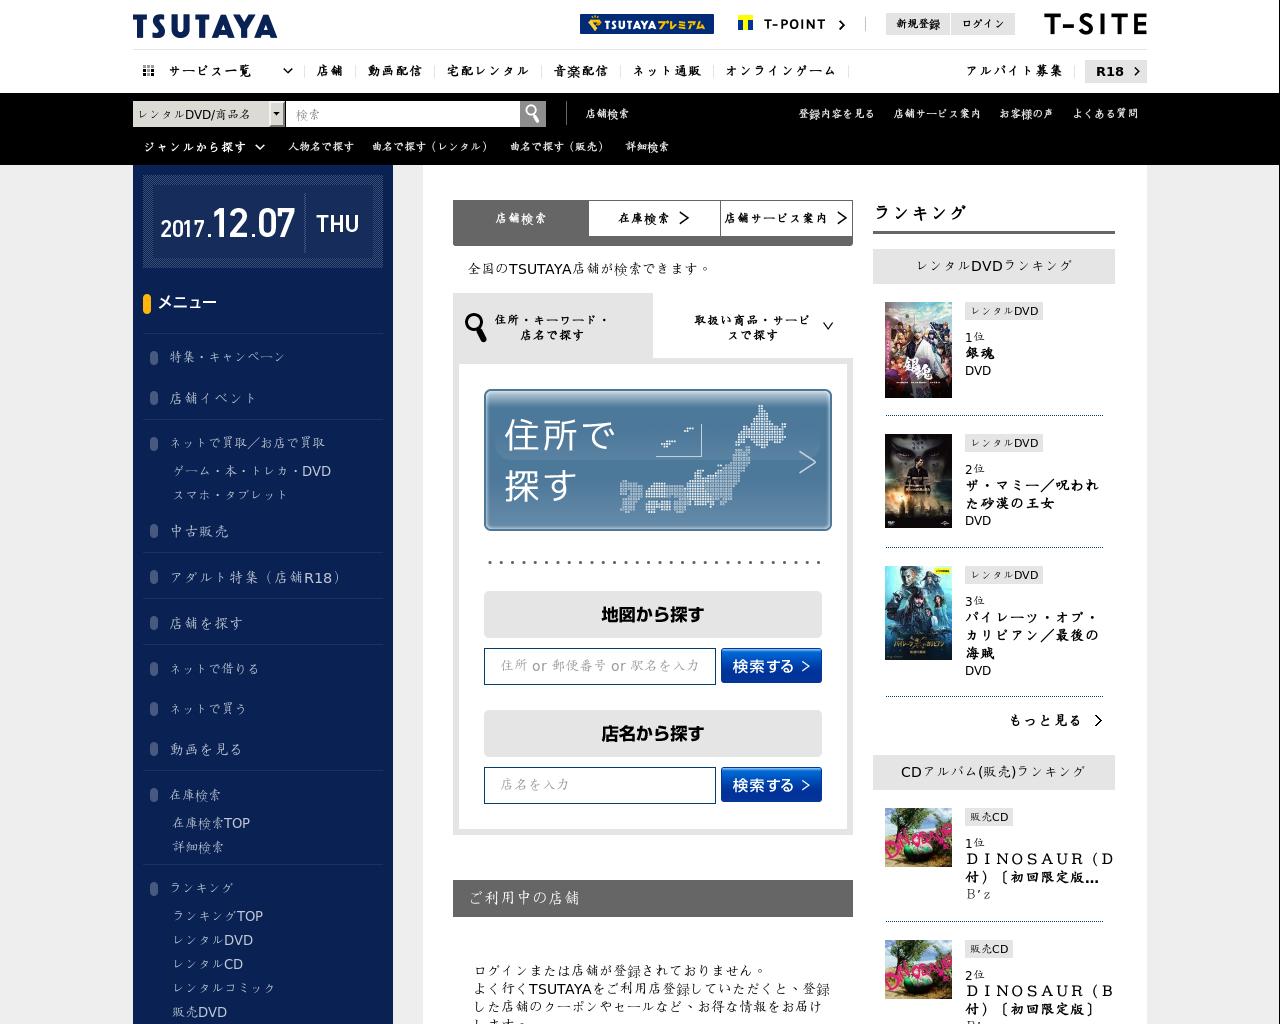 store-tsutaya.tsite.jp(2017/12/07 06:50:48)